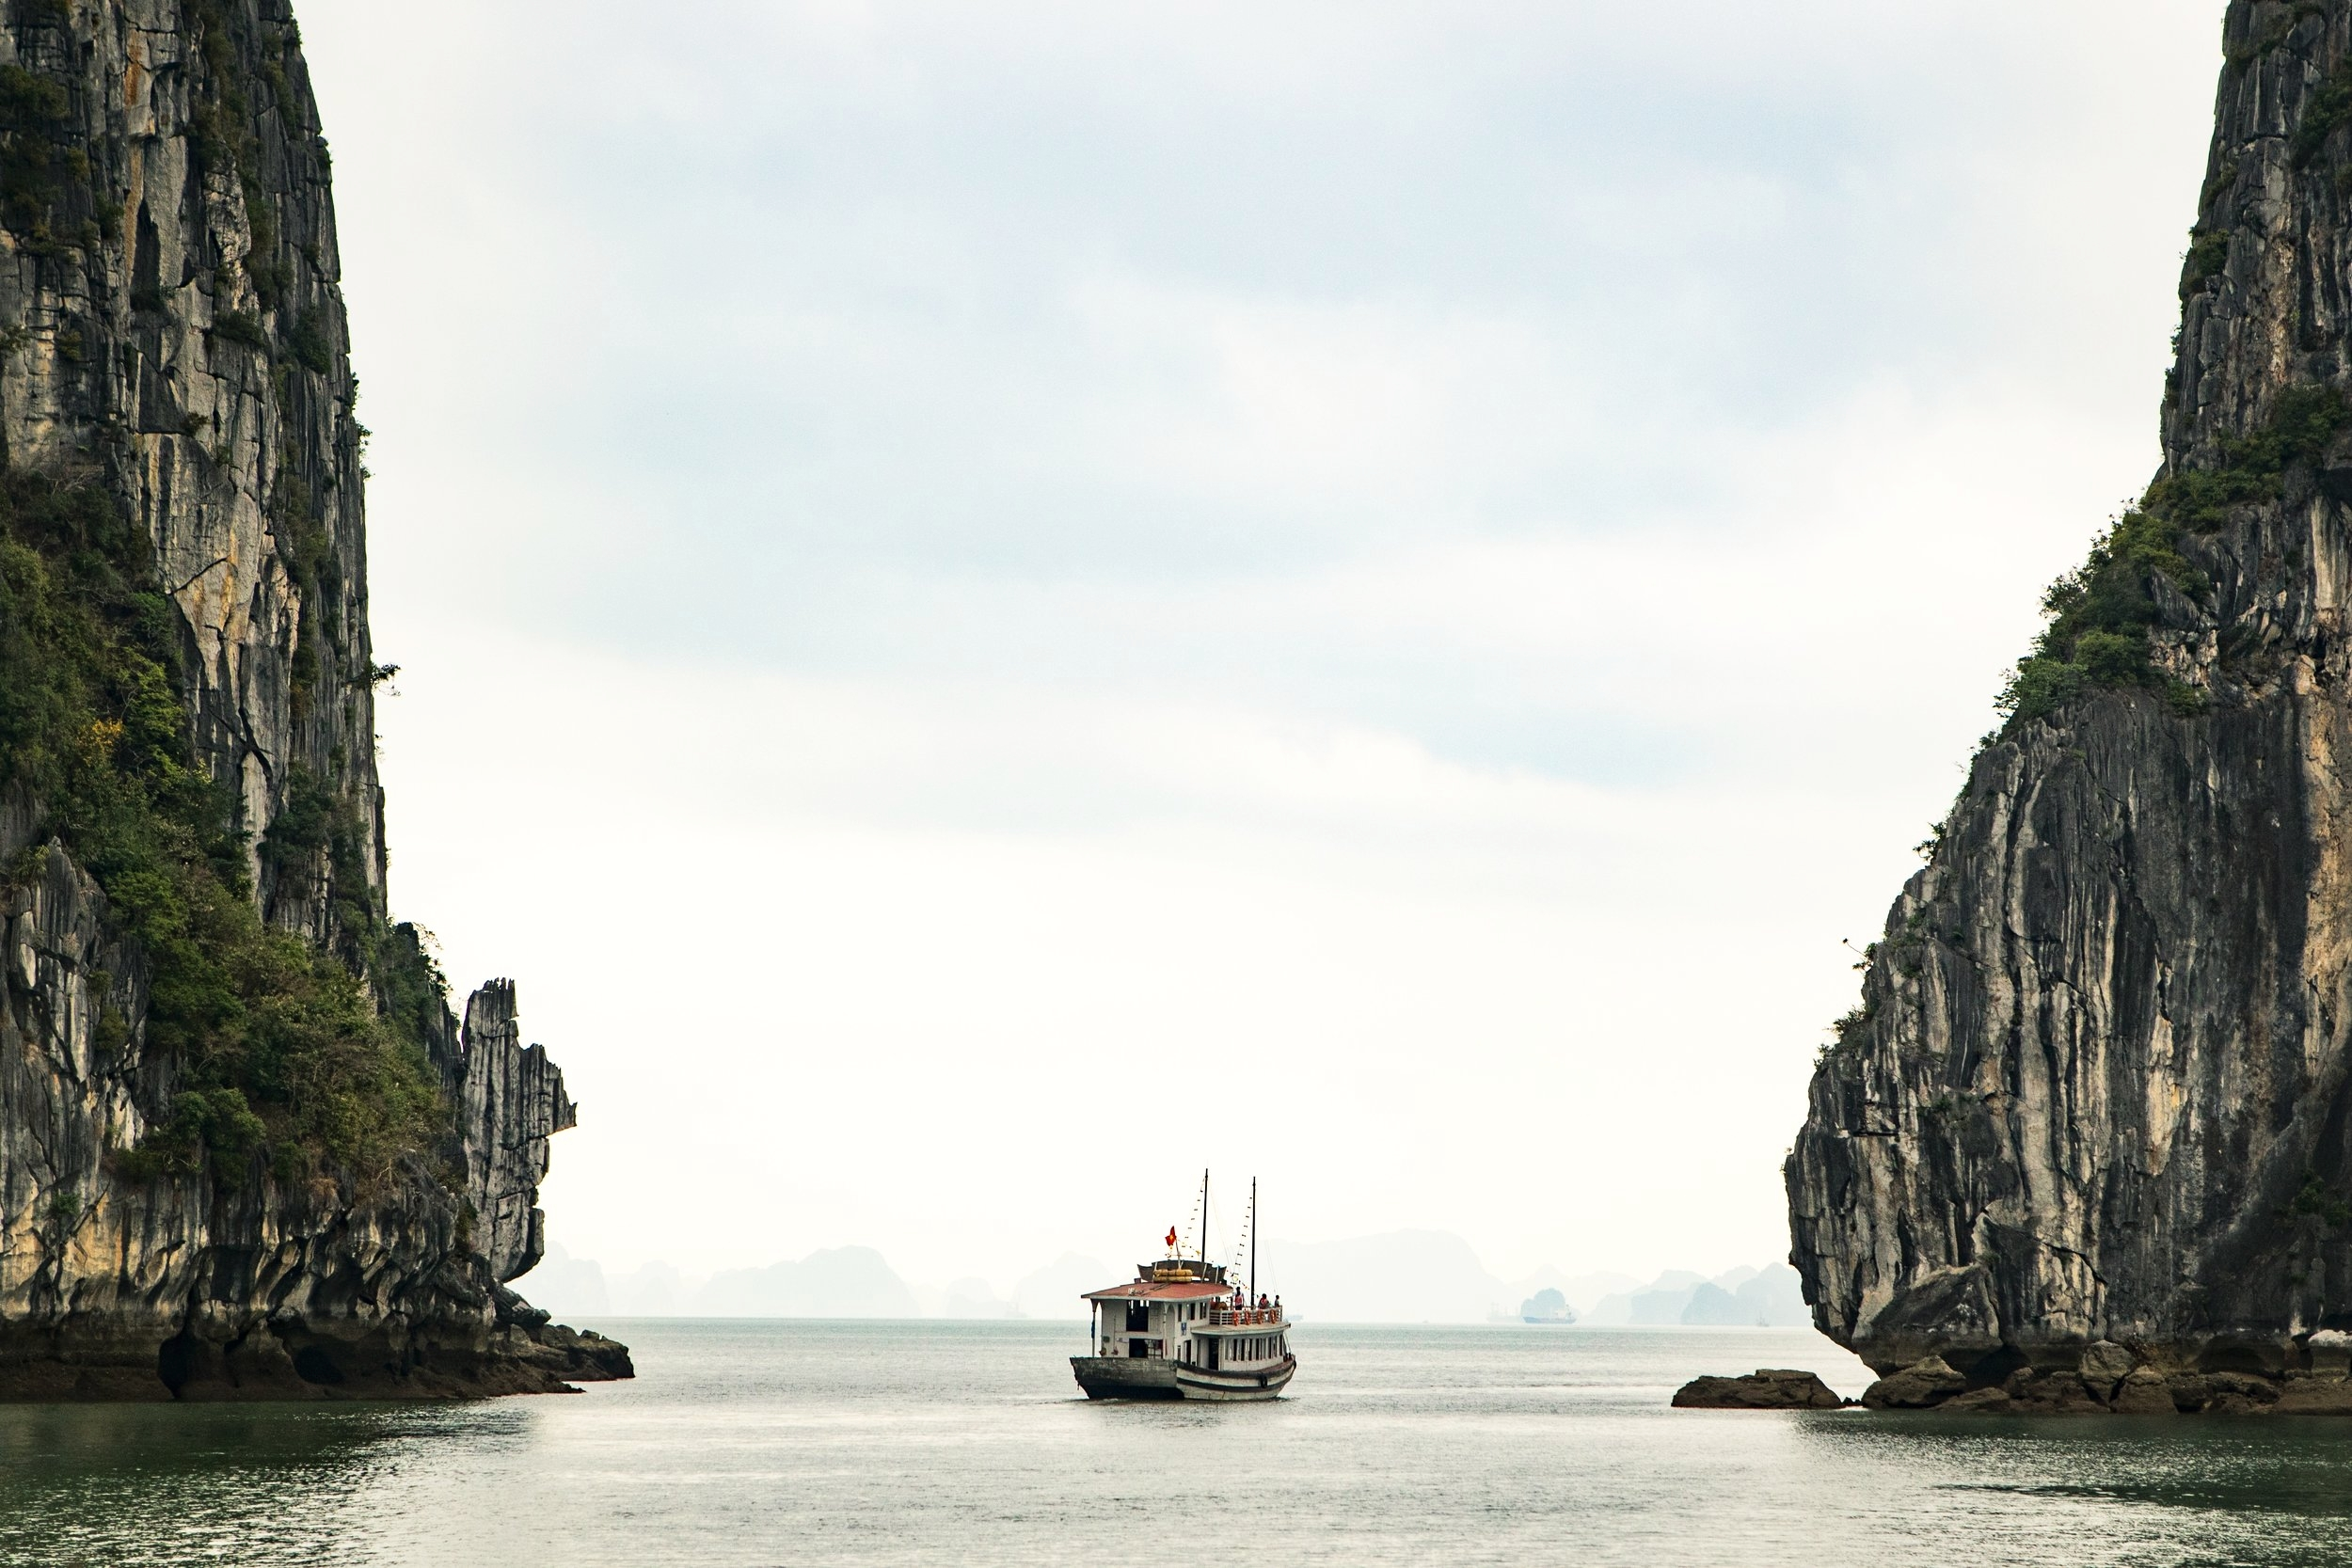 Ha Long Bay in Ha Noi, Vietnam